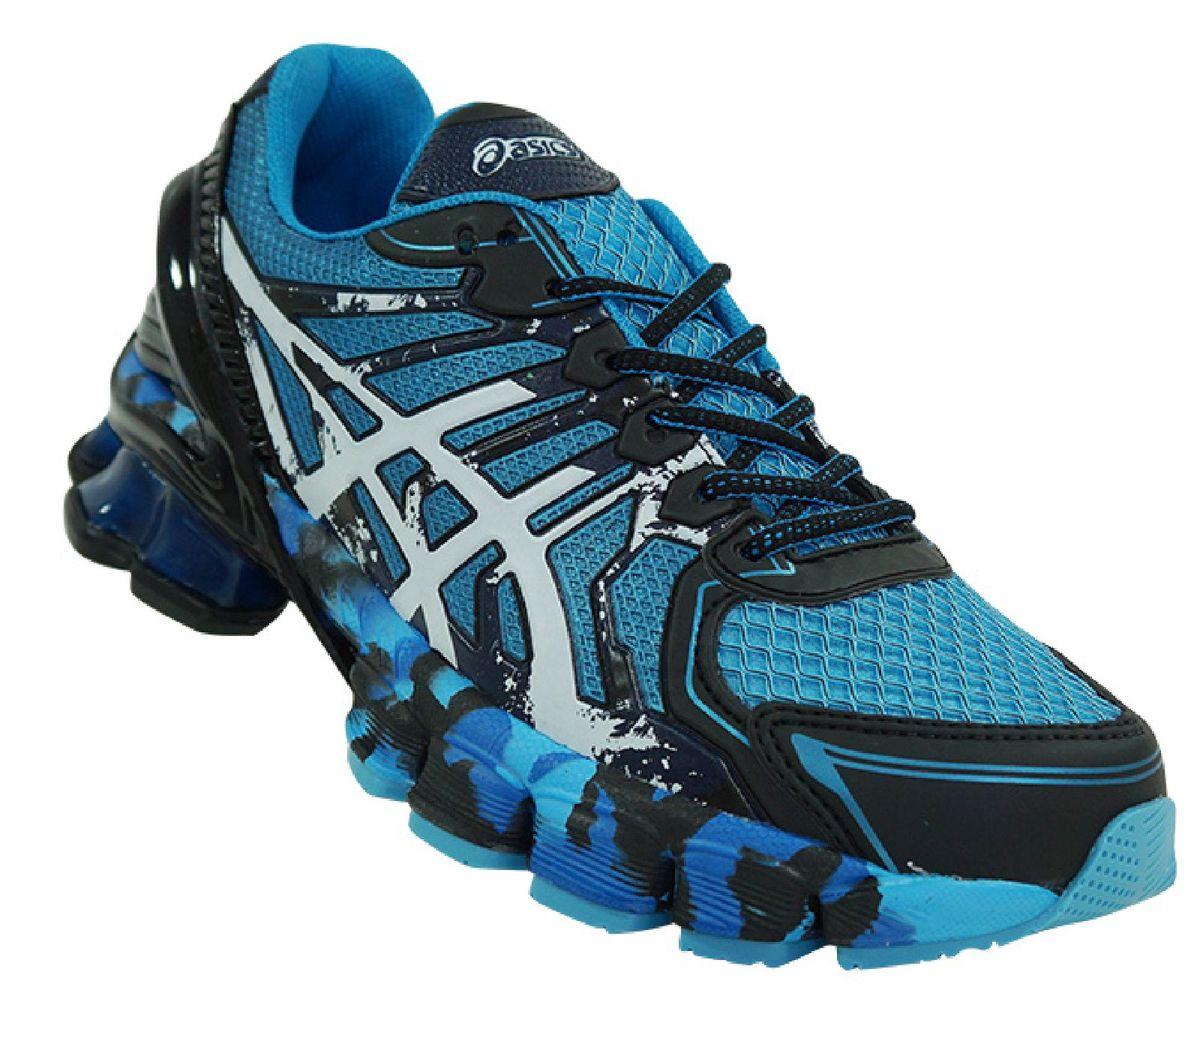 best authentic 76adb b5fd3 tênis asics gel sendai 2 azul e preto - tênis asics